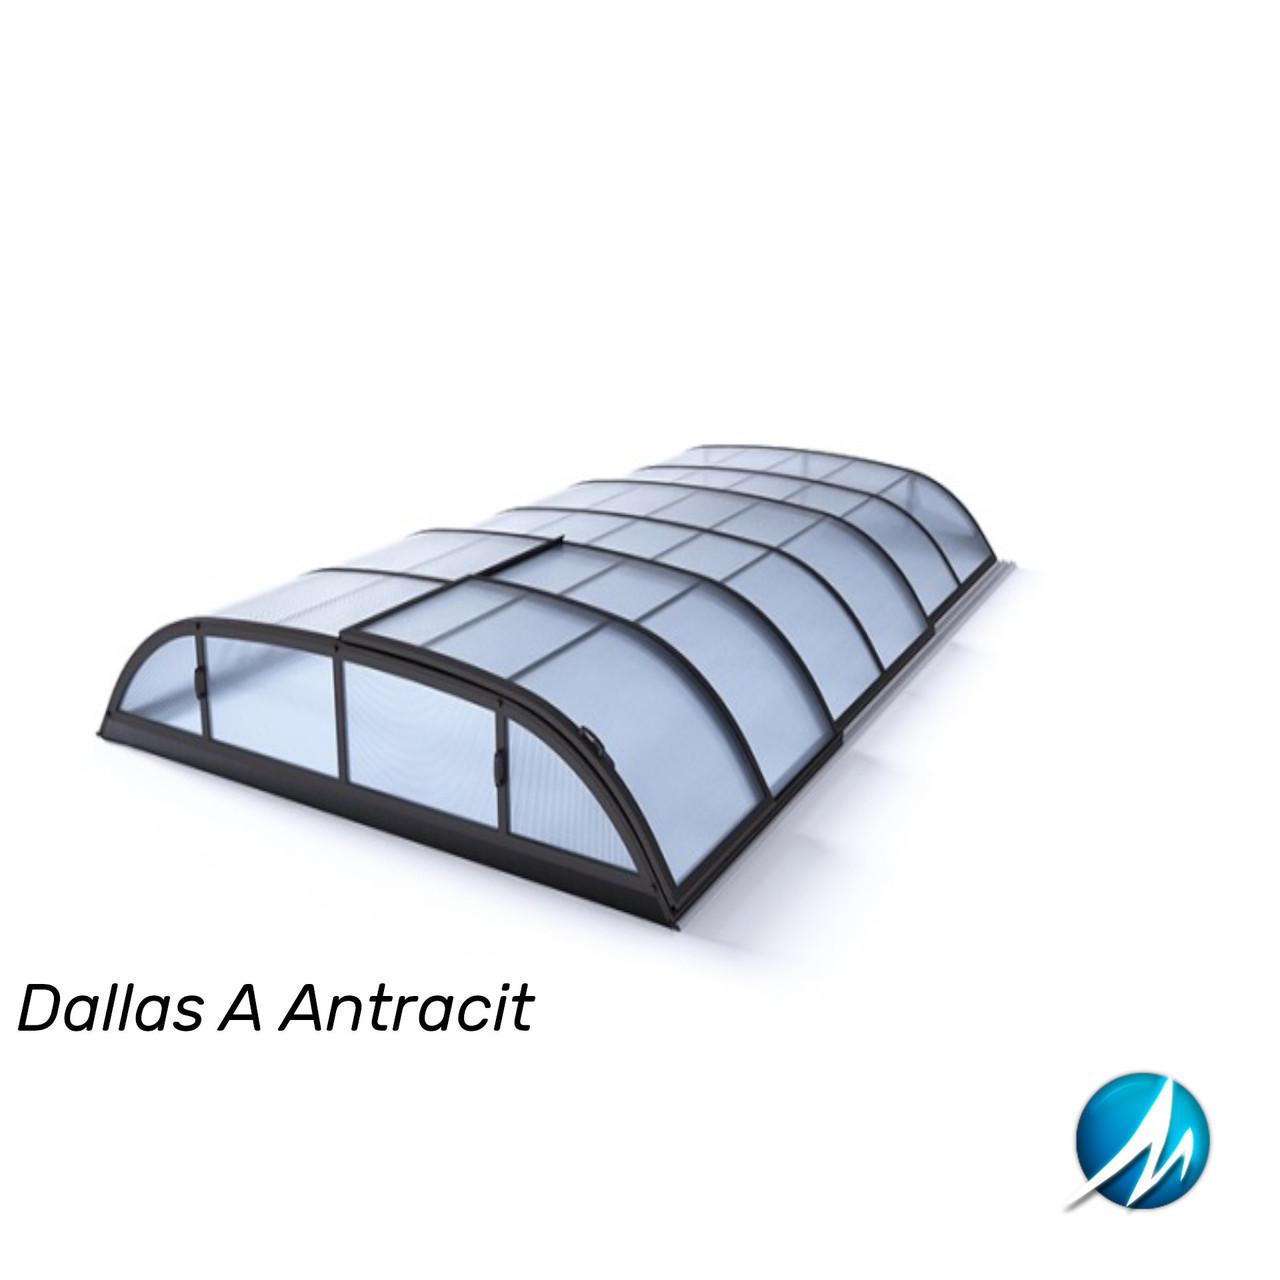 Павильон для бассейна Dallas A 4,07x6,4x0,82м - Antracit